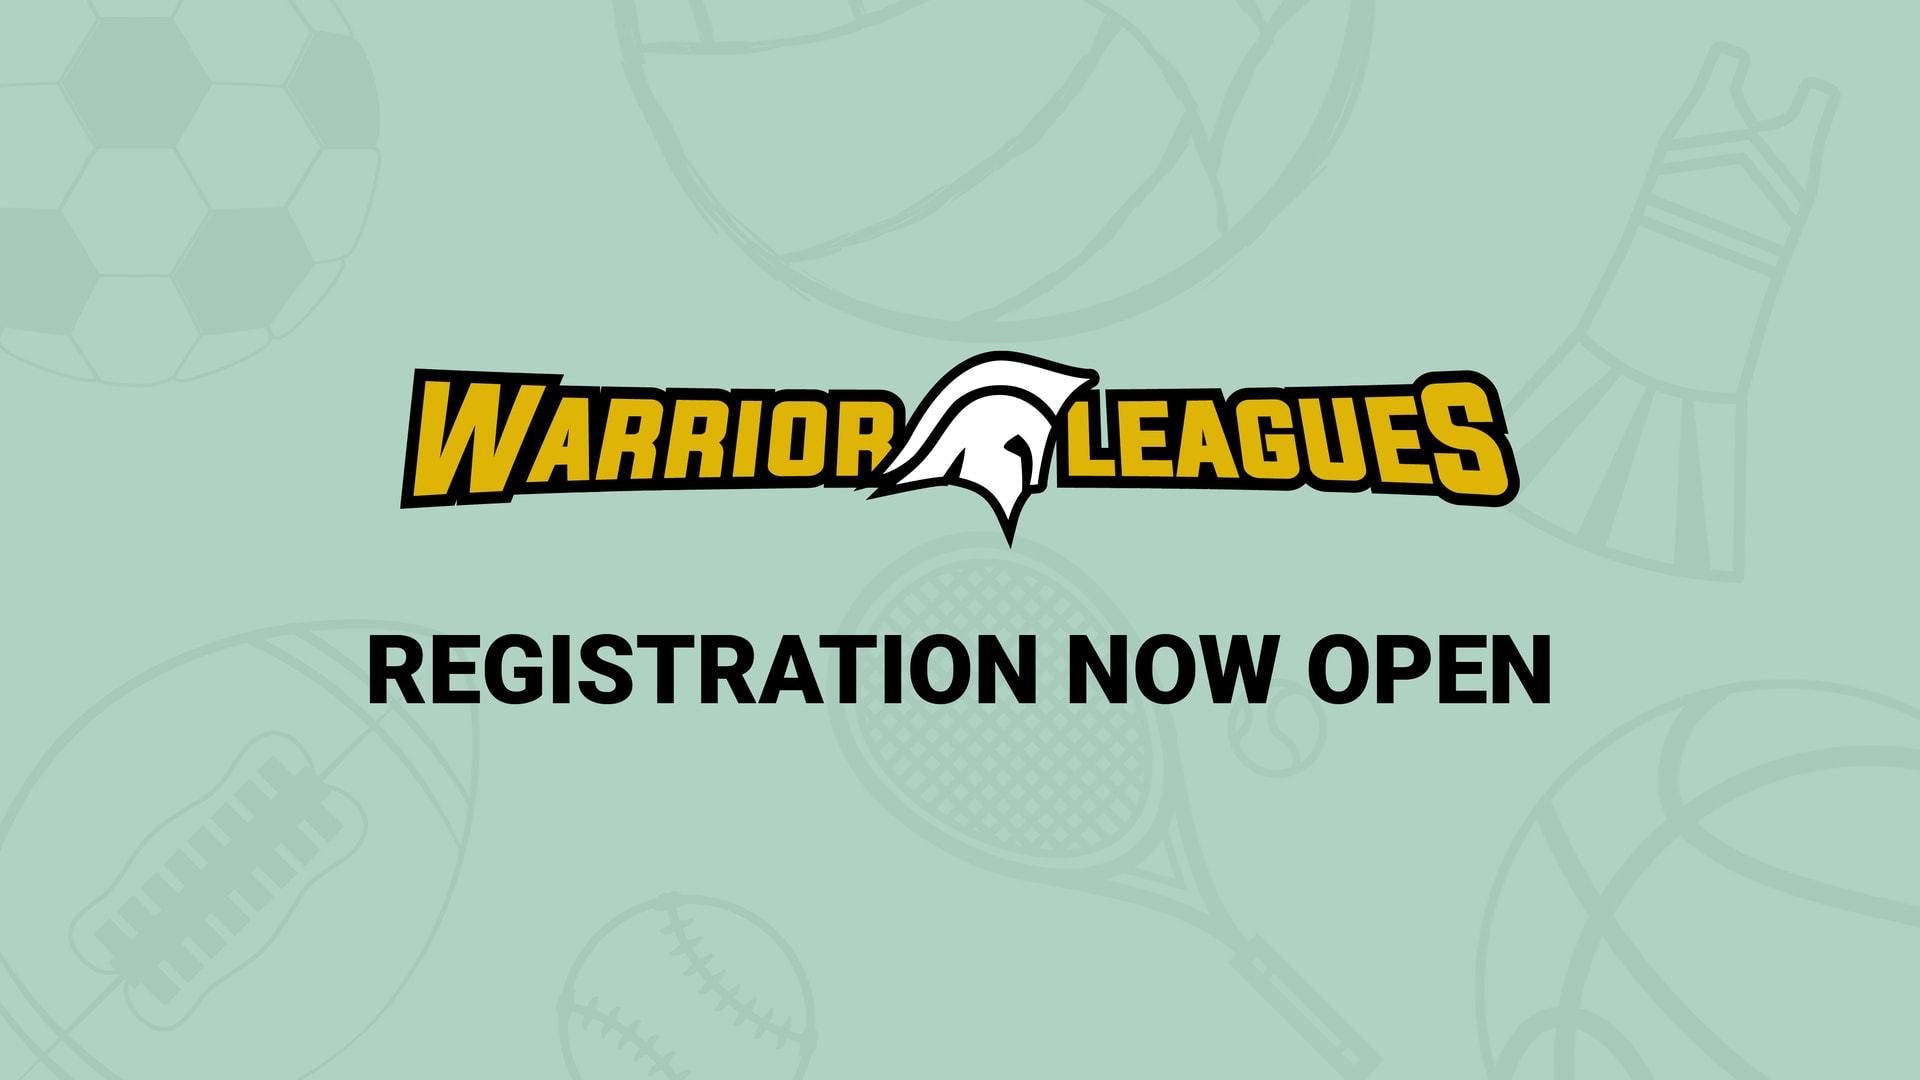 Warrior Leagues